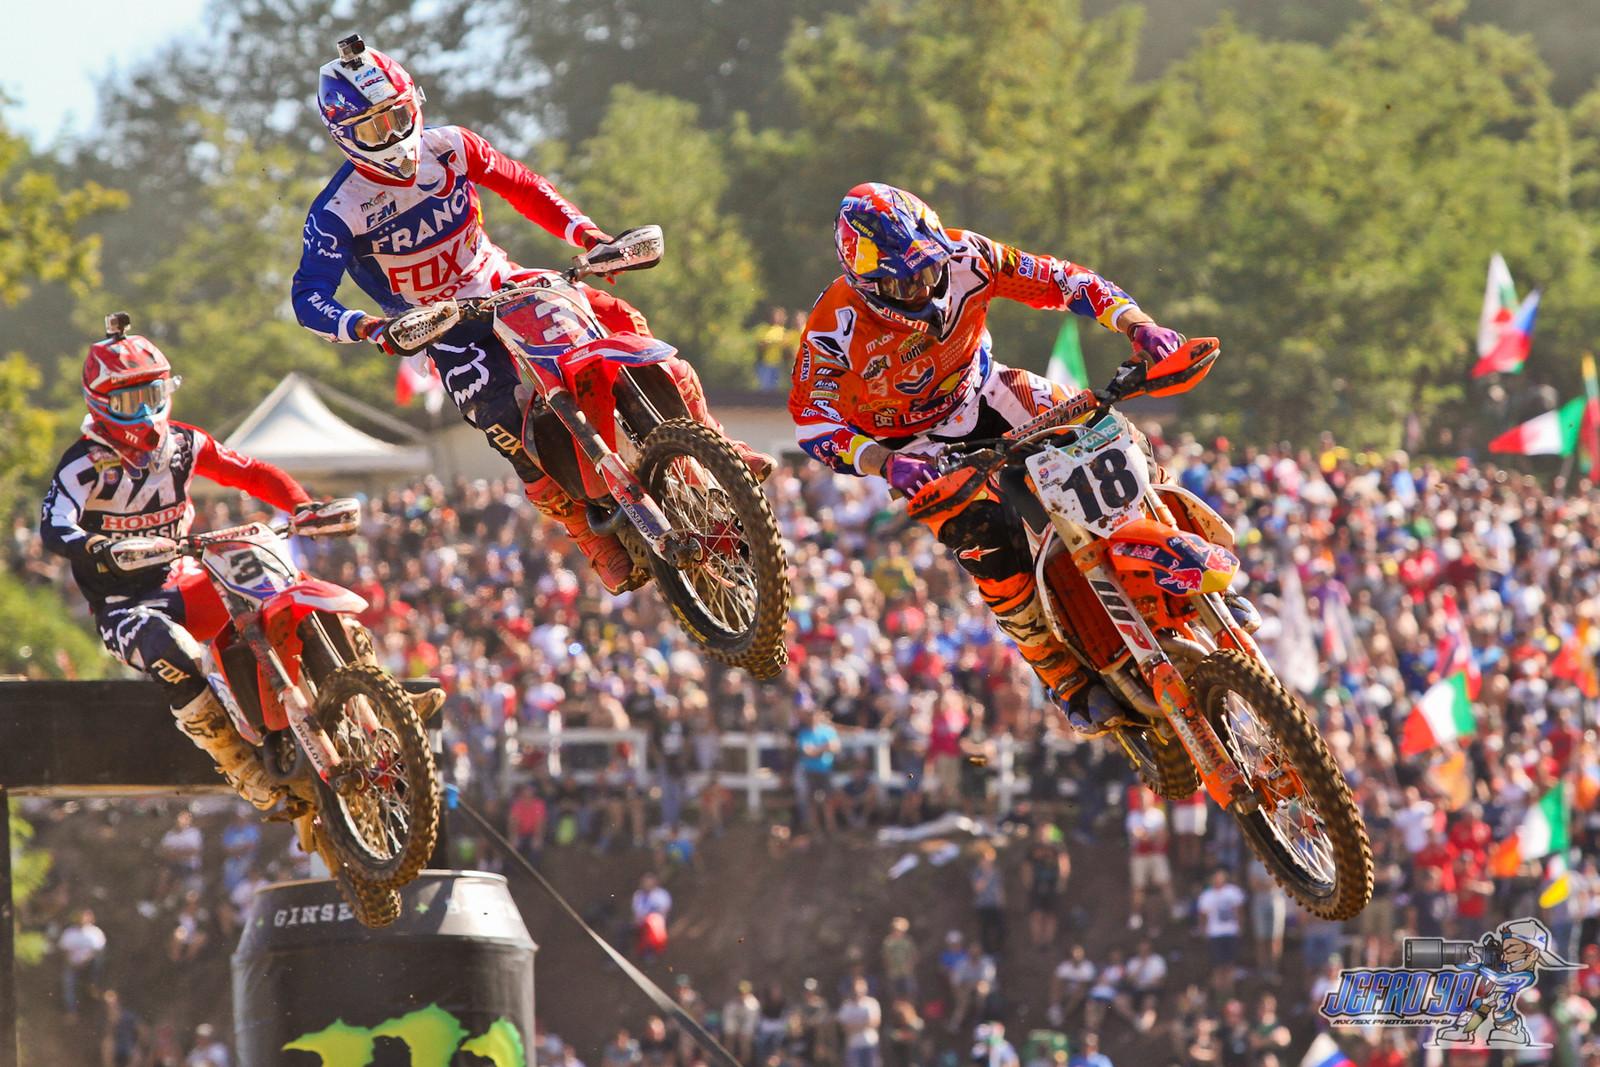 Open Class battle - PhotoGallery: MXoN Sunday - Motocross Pictures - Vital MX